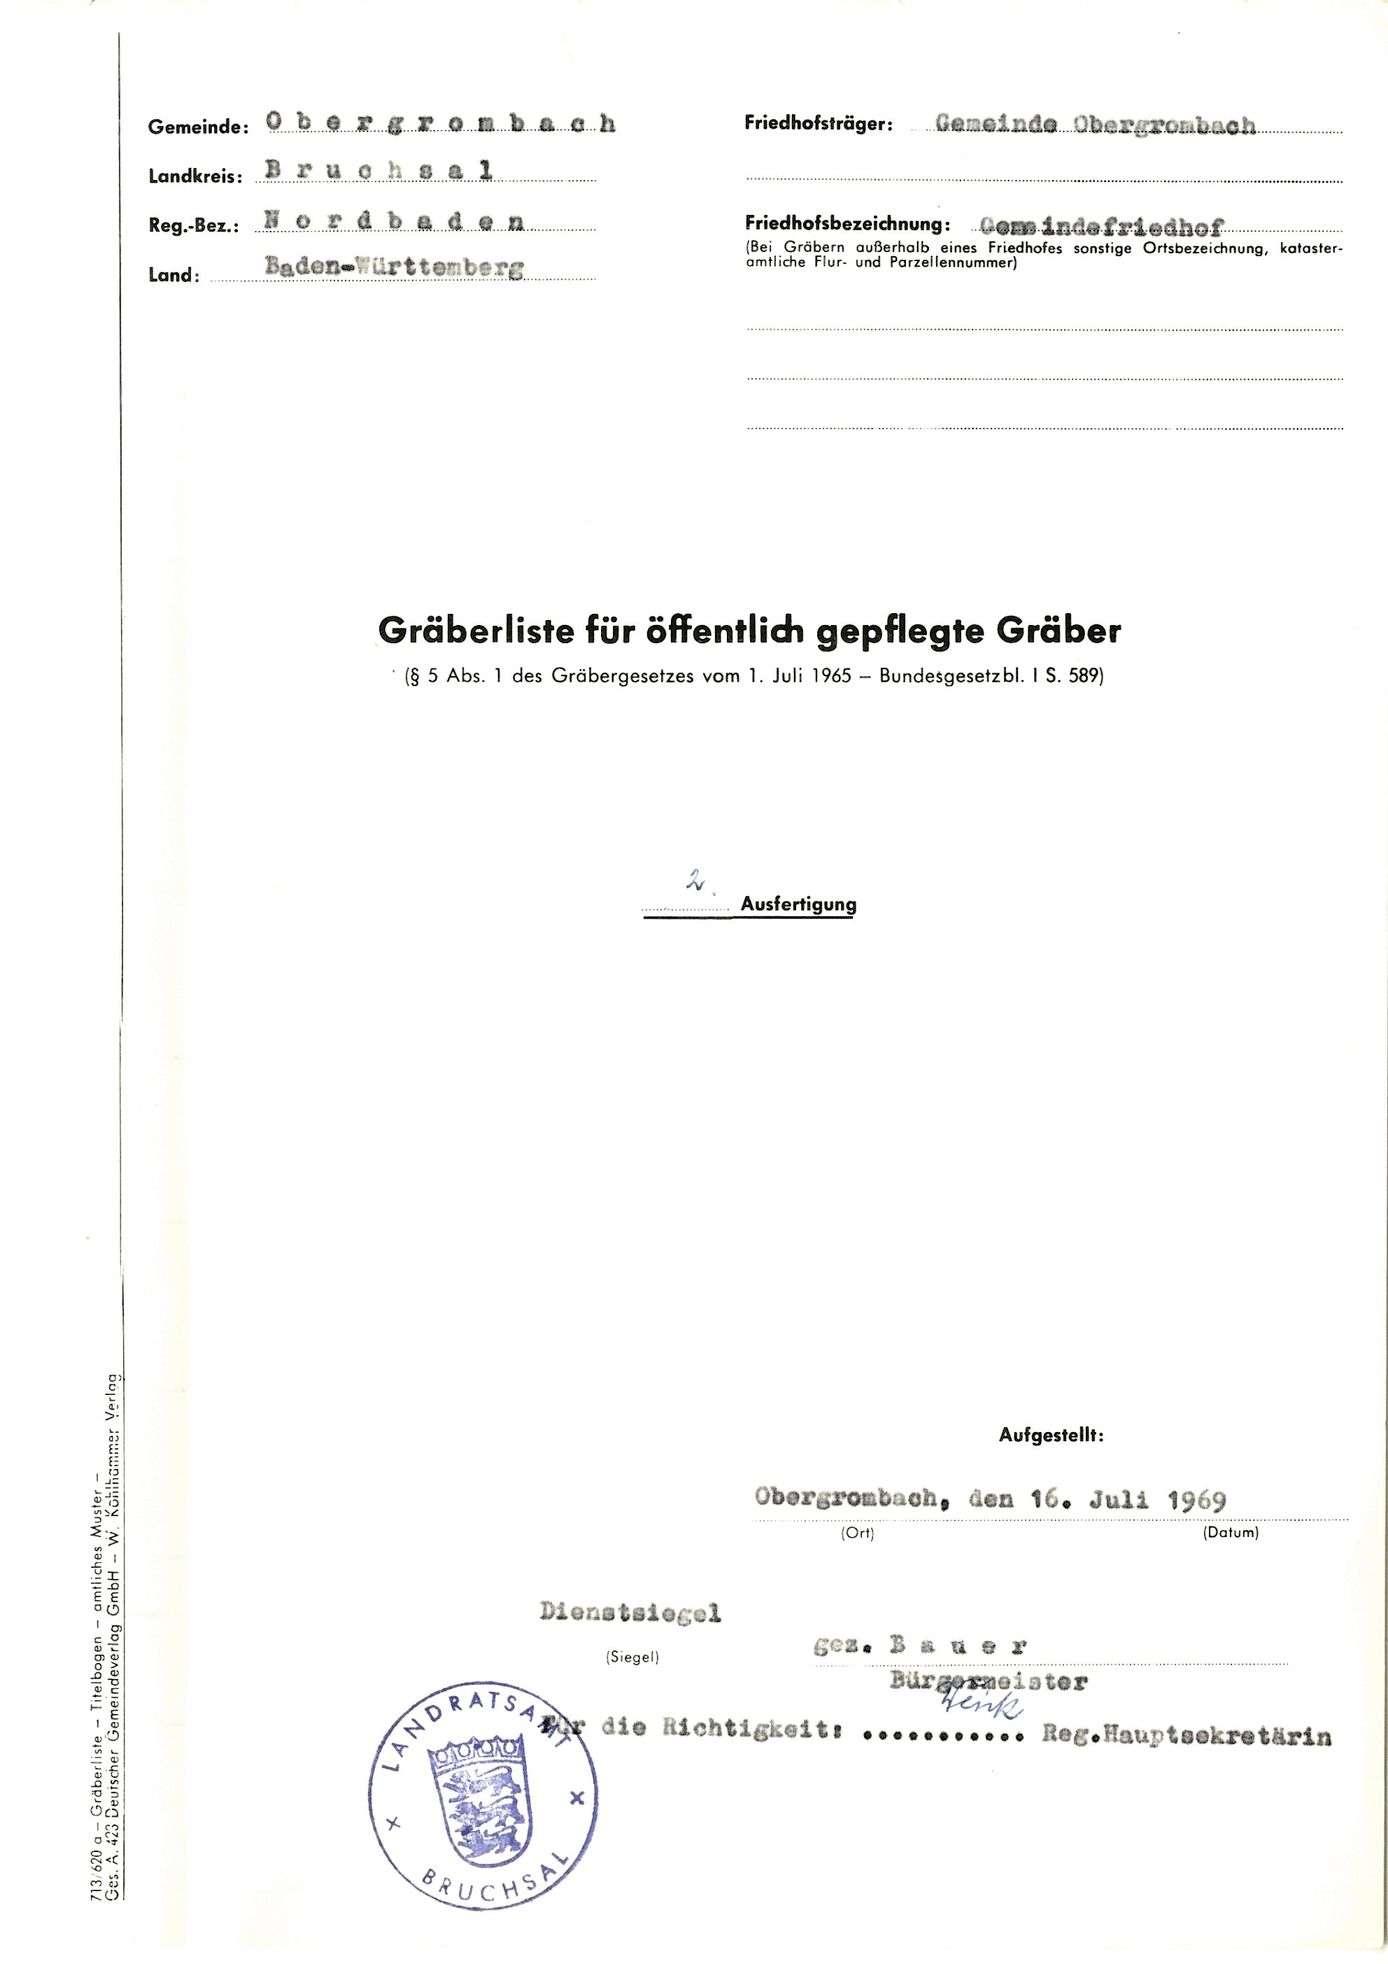 Obergrombach, Bild 1